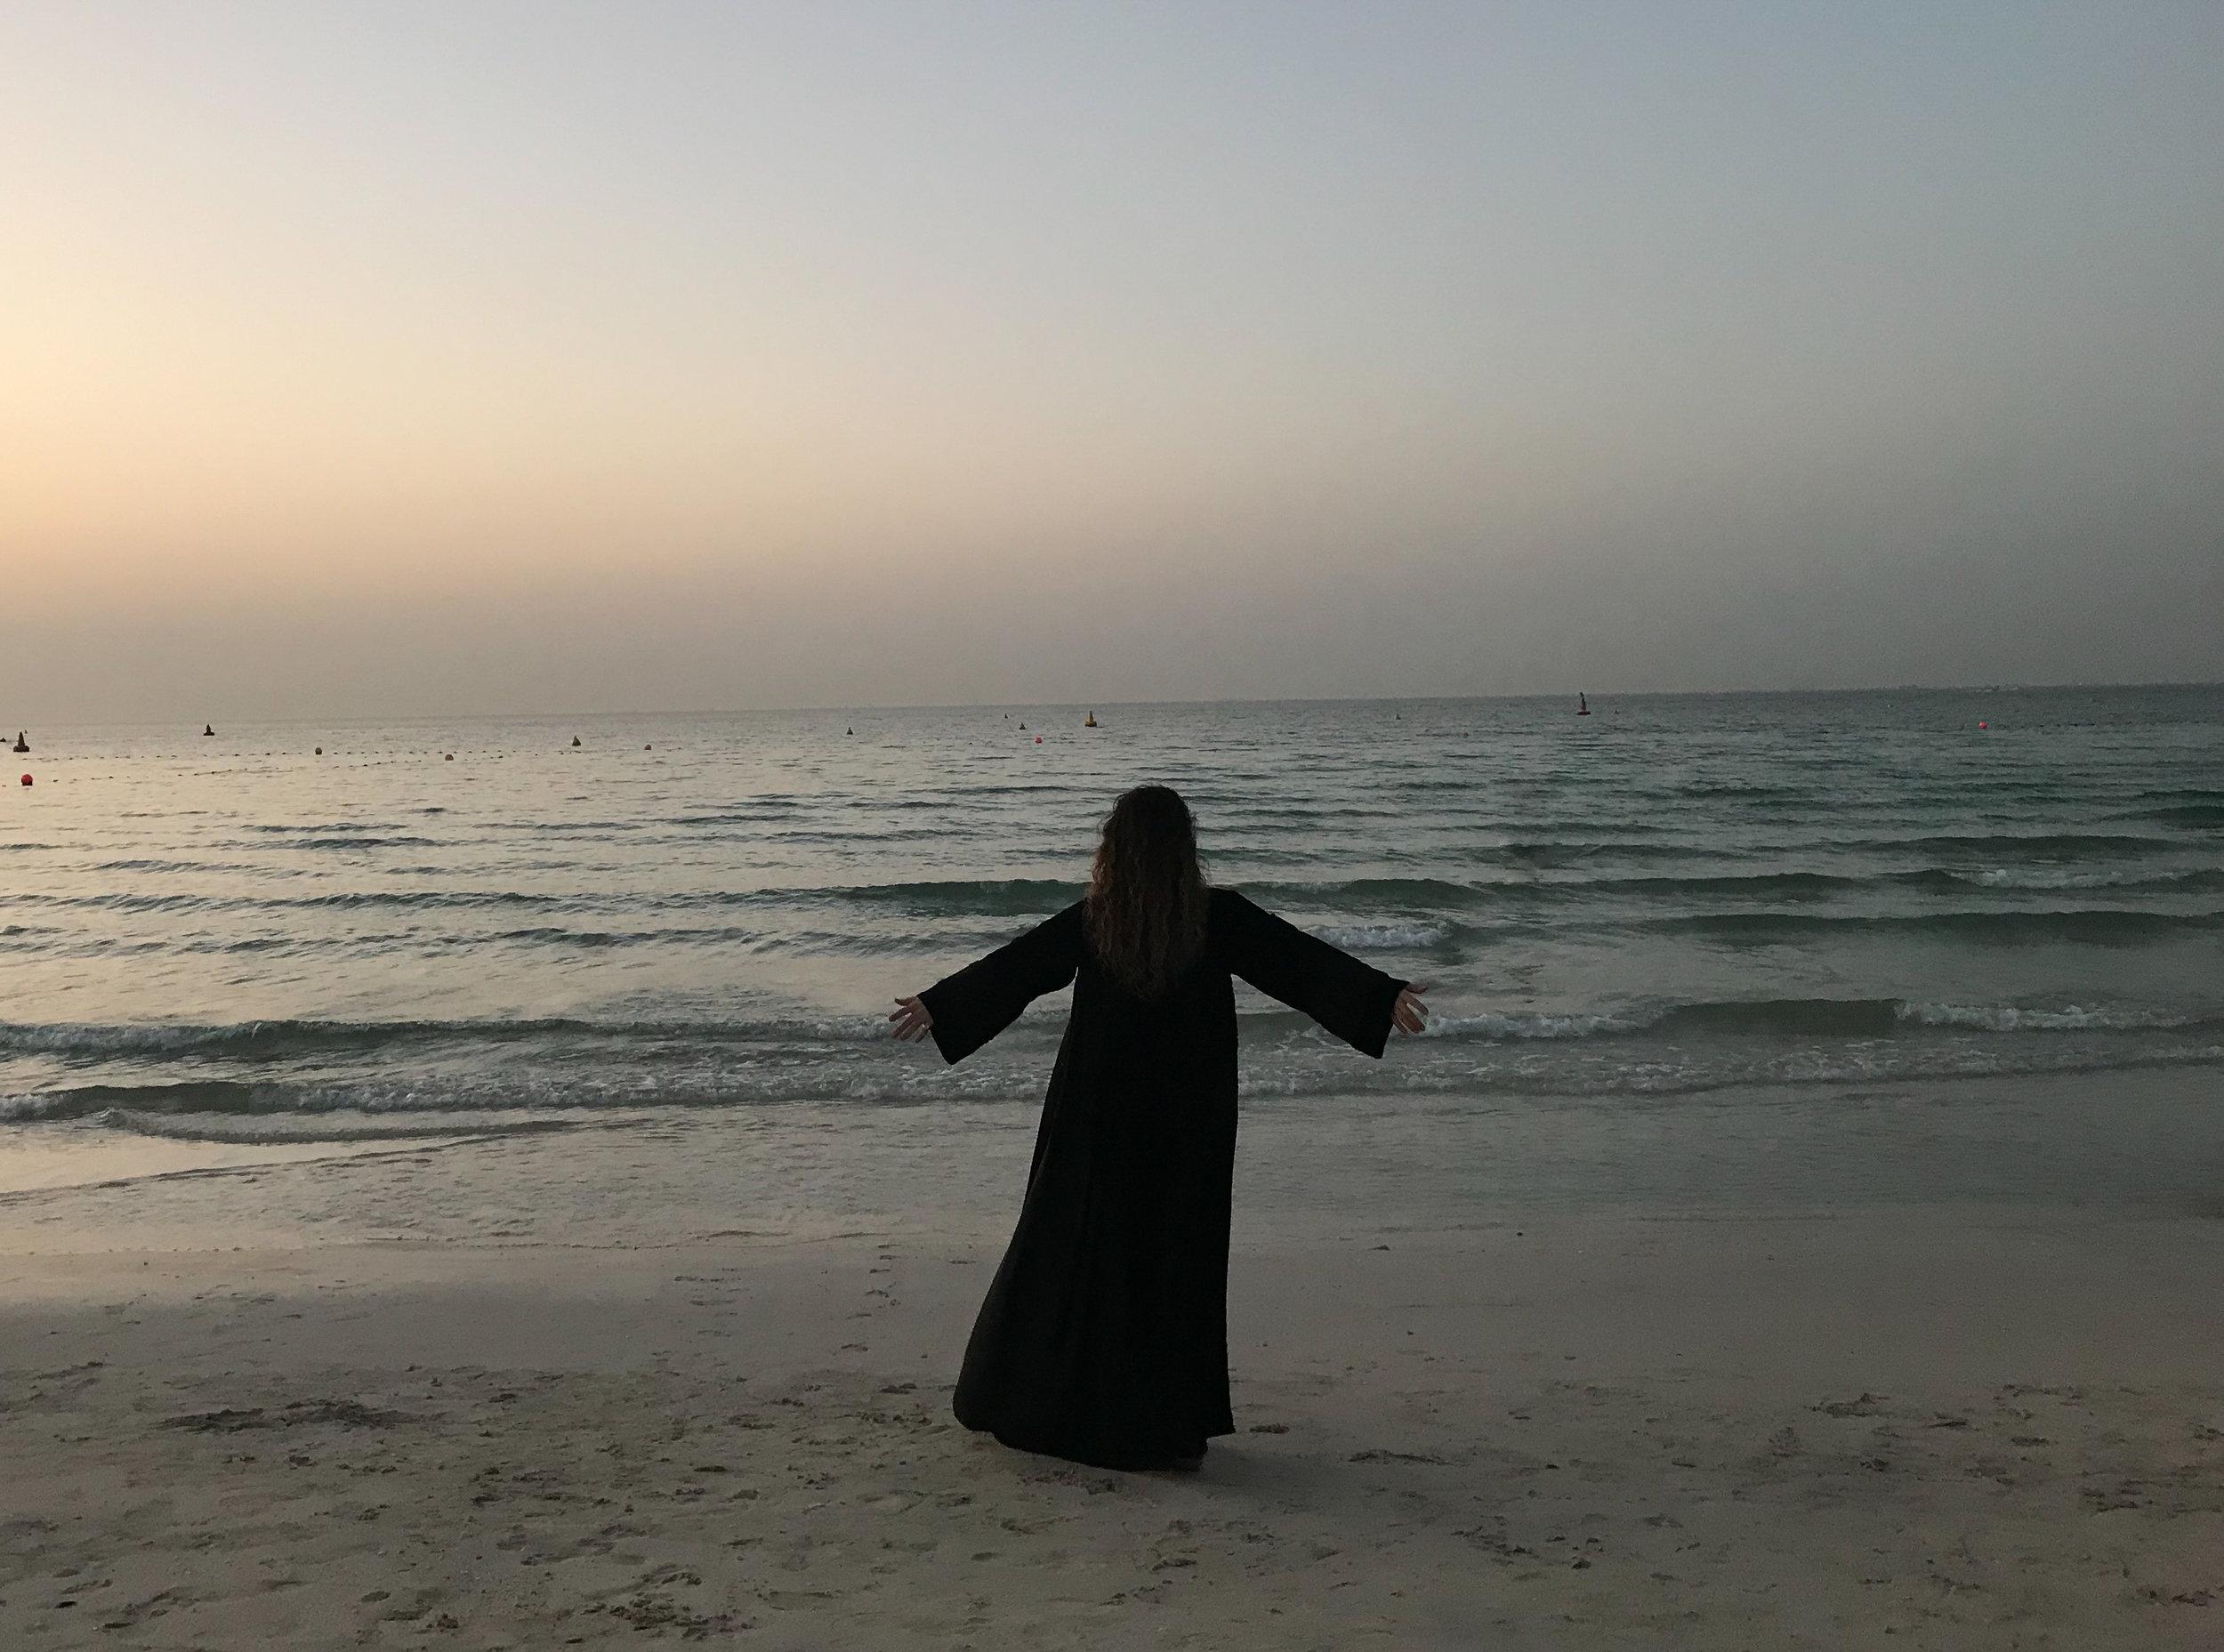 JUMEIRAH BEACH • DUBAI, UAE PHOTOGRAPHER: JAMILA